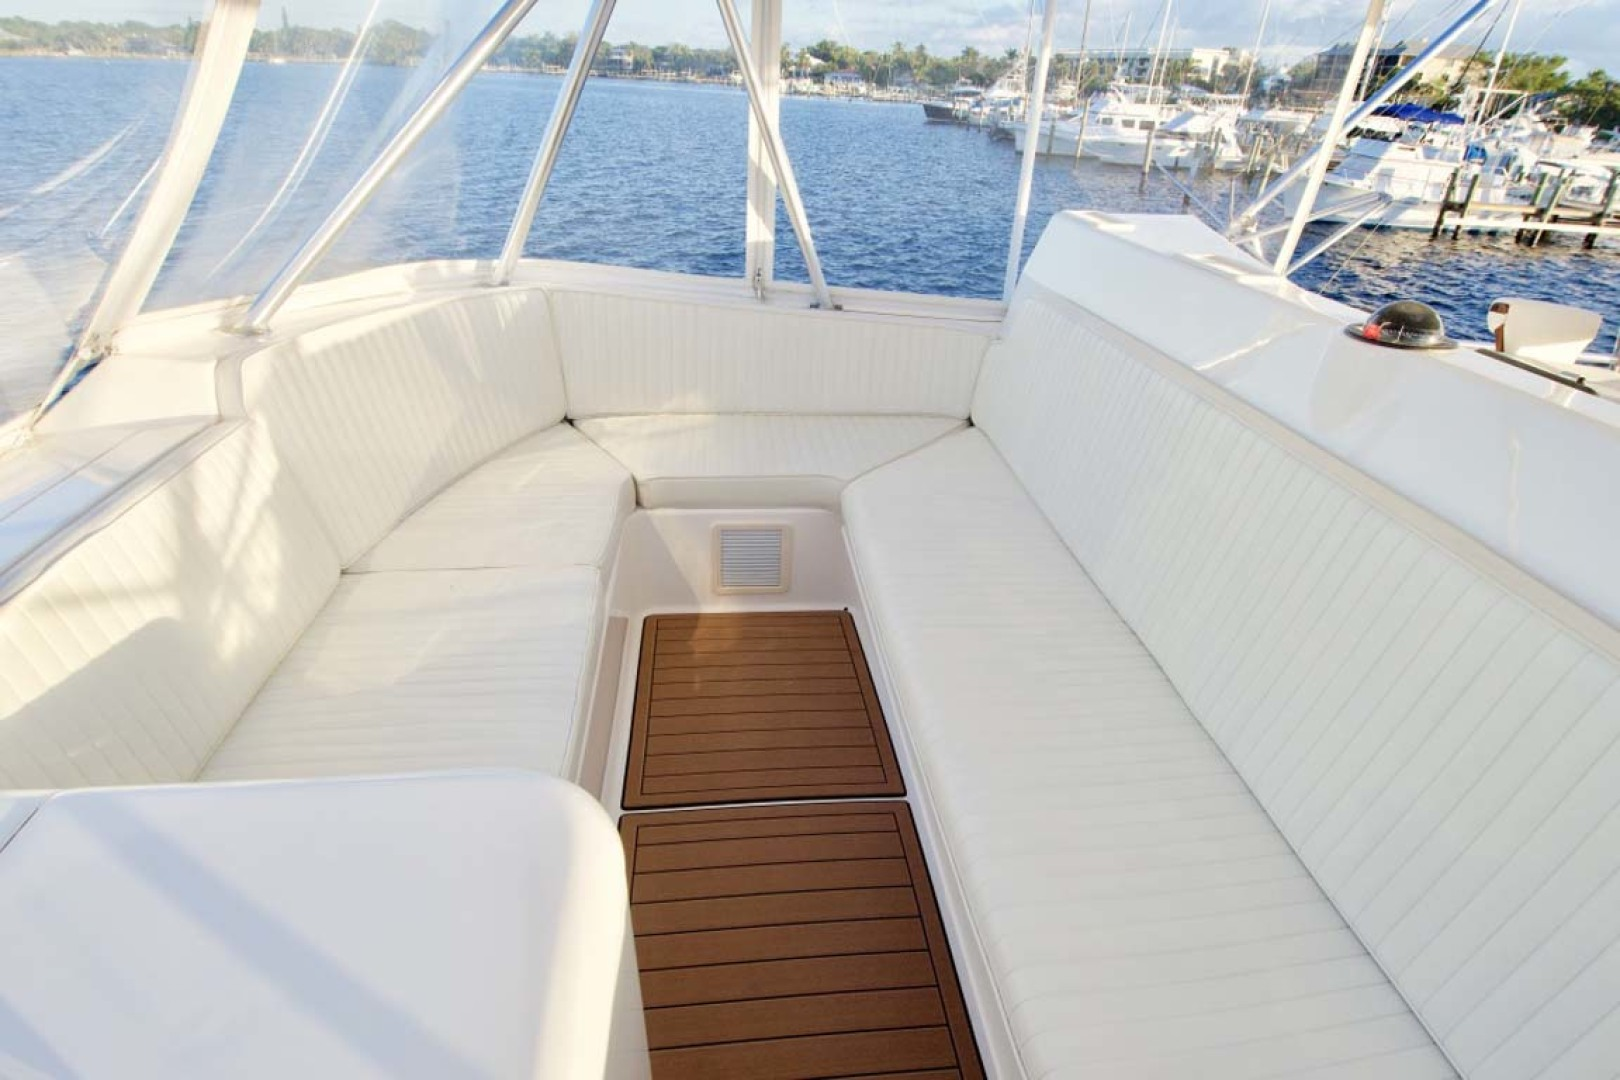 Ocean Yachts-57 SS 2006-Deliverance Stuart-Florida-United States-Flybridge Seating-1102257 | Thumbnail